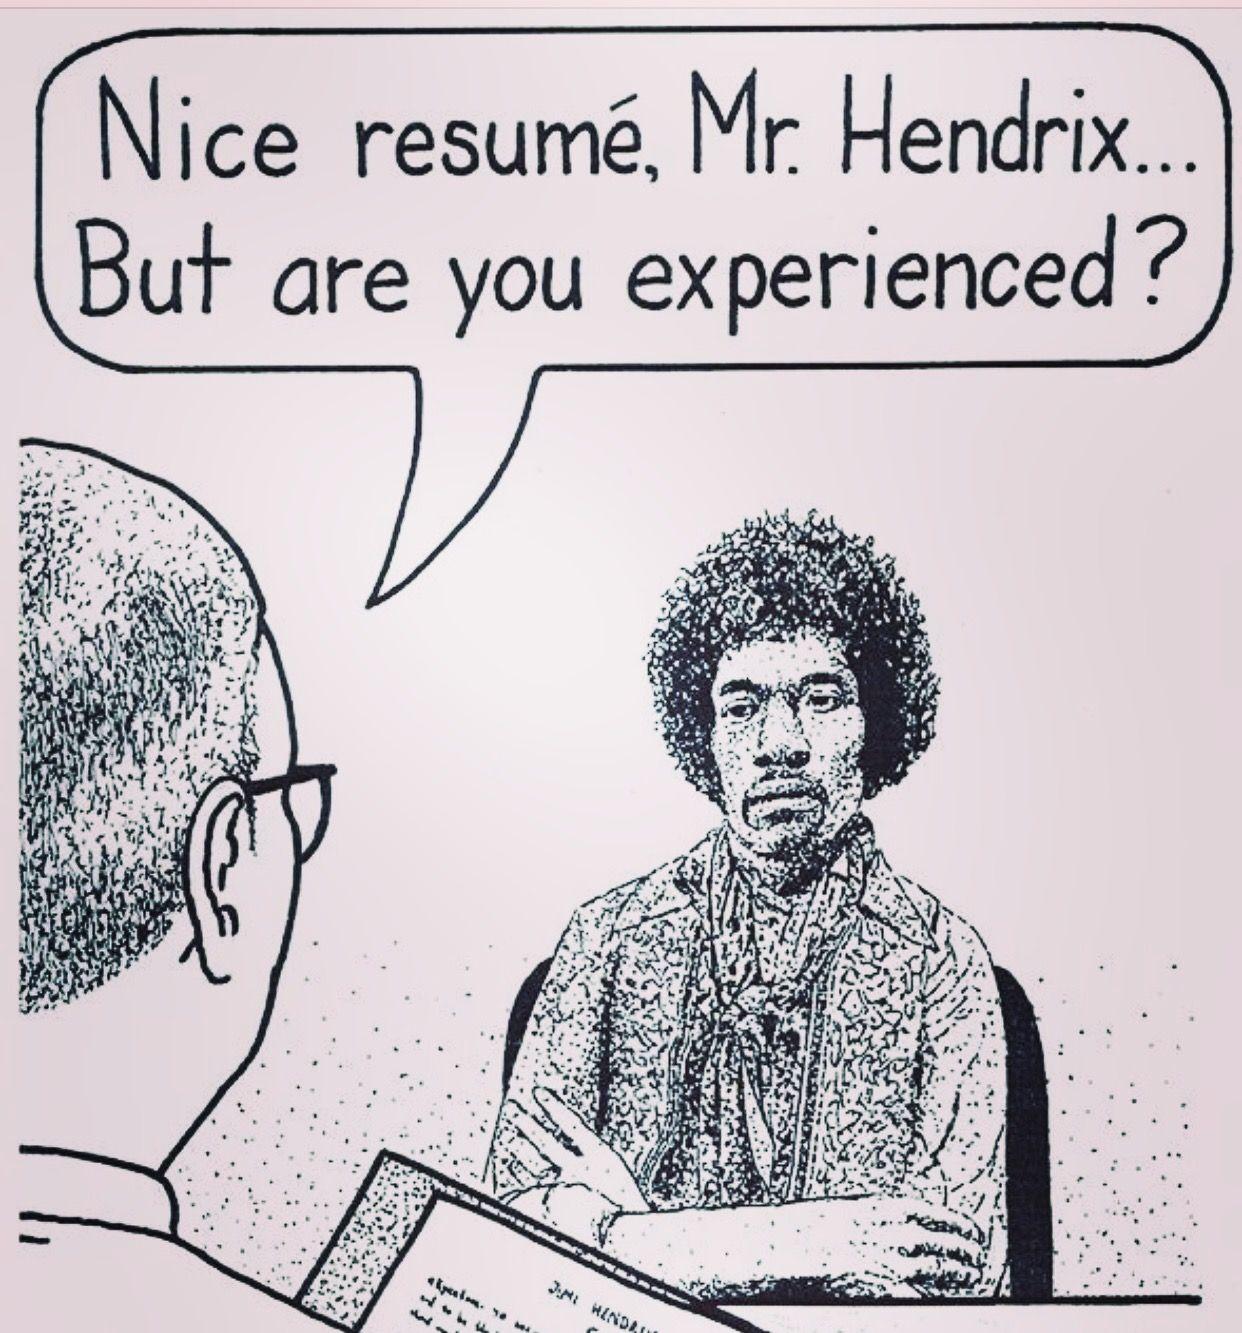 Are you Experienced? JimiHendrix Jimi Jimi hendrix